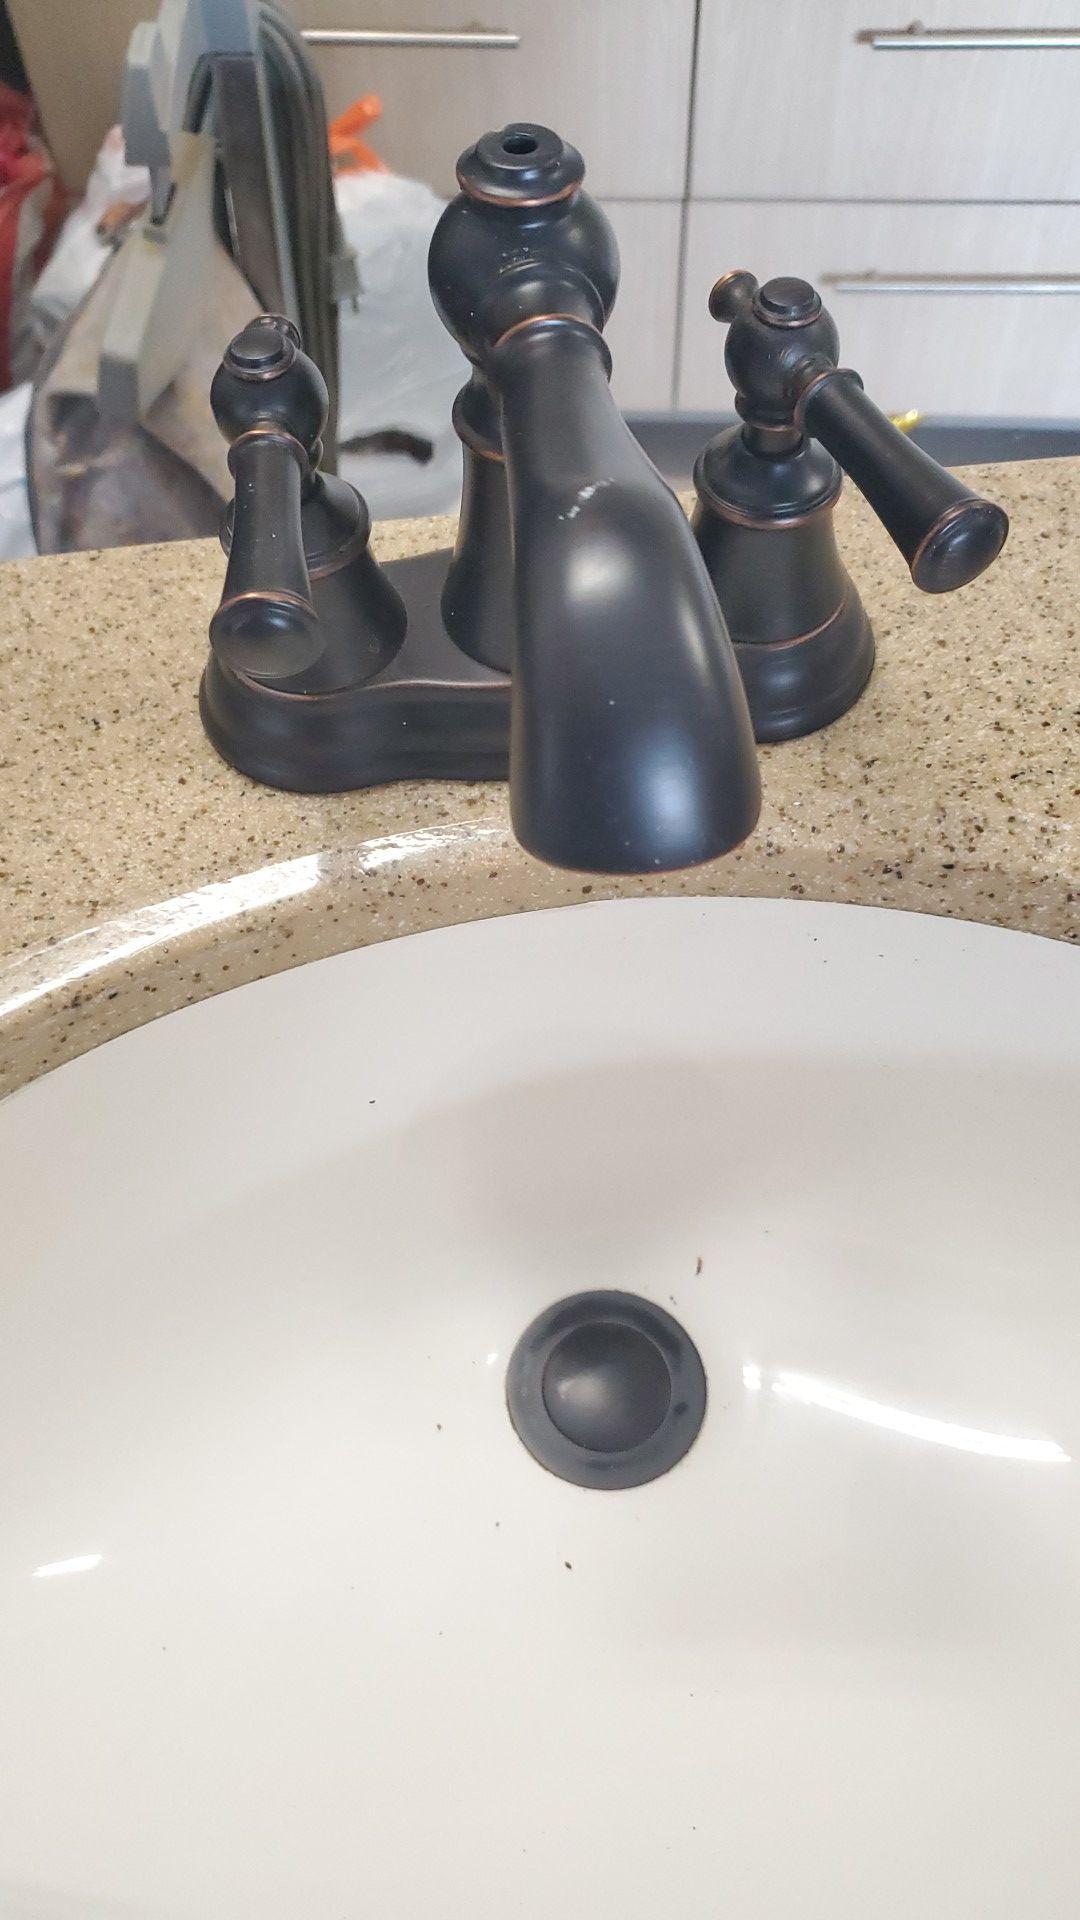 AquaSource faucet